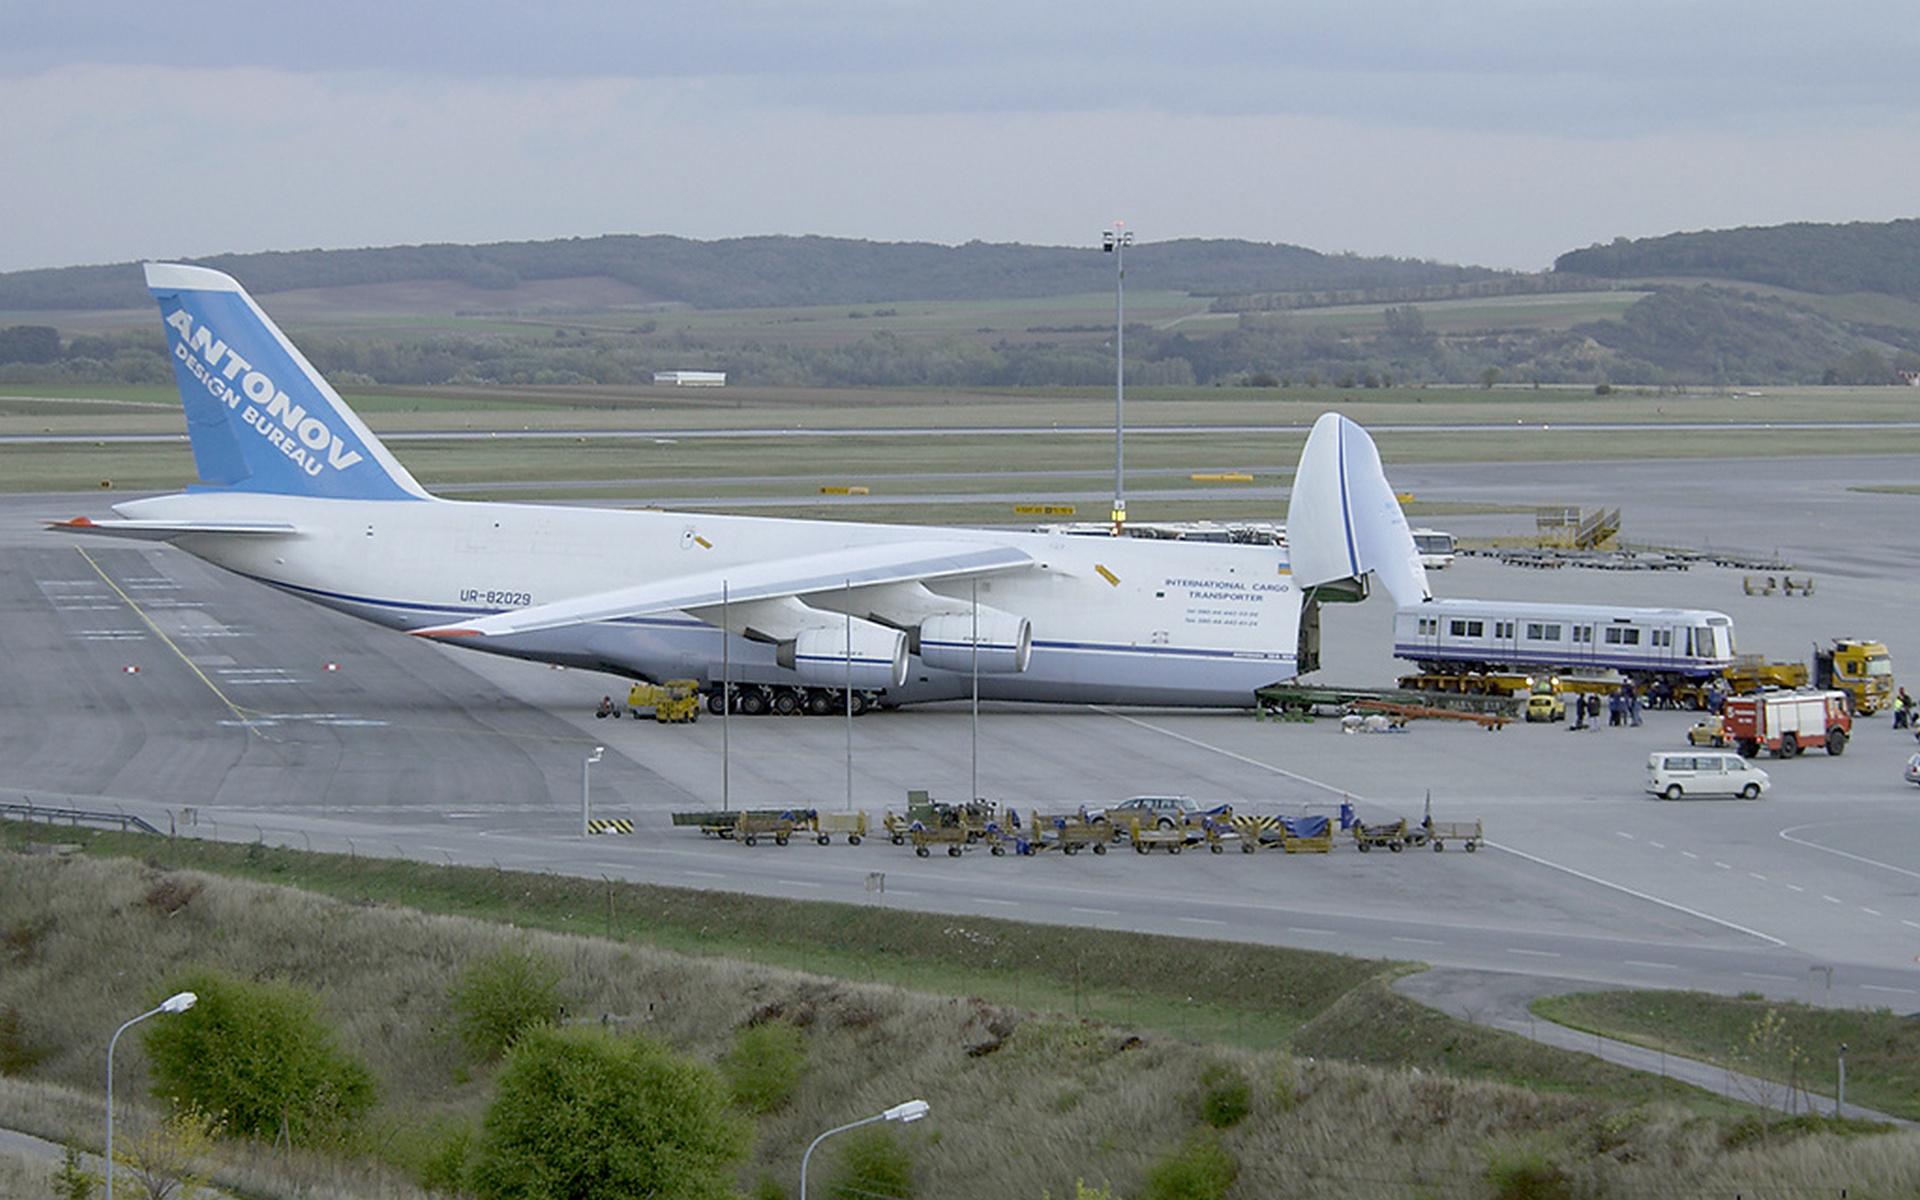 аэродром, самолет грузовой, погрузка